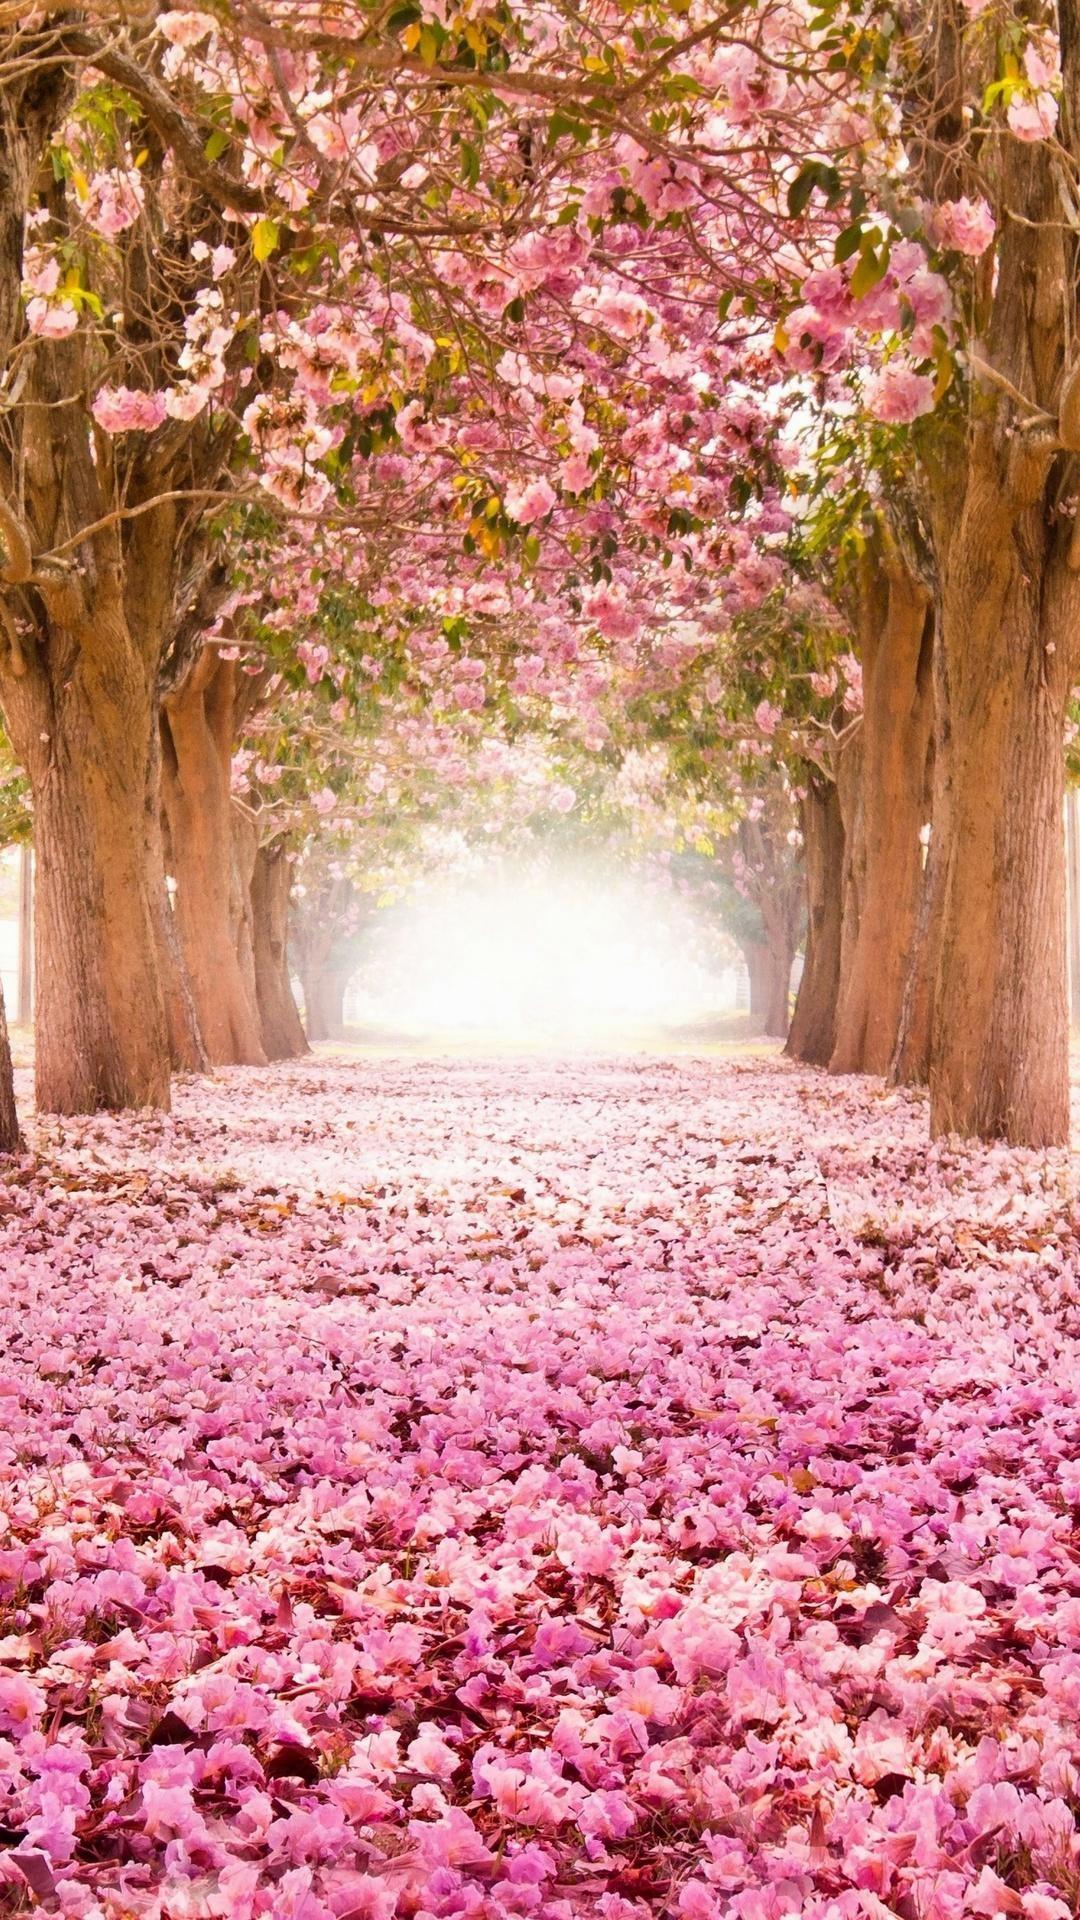 1080x1920 Wallpaperwiki Free Cherry Blossom IPhone Photo PIC